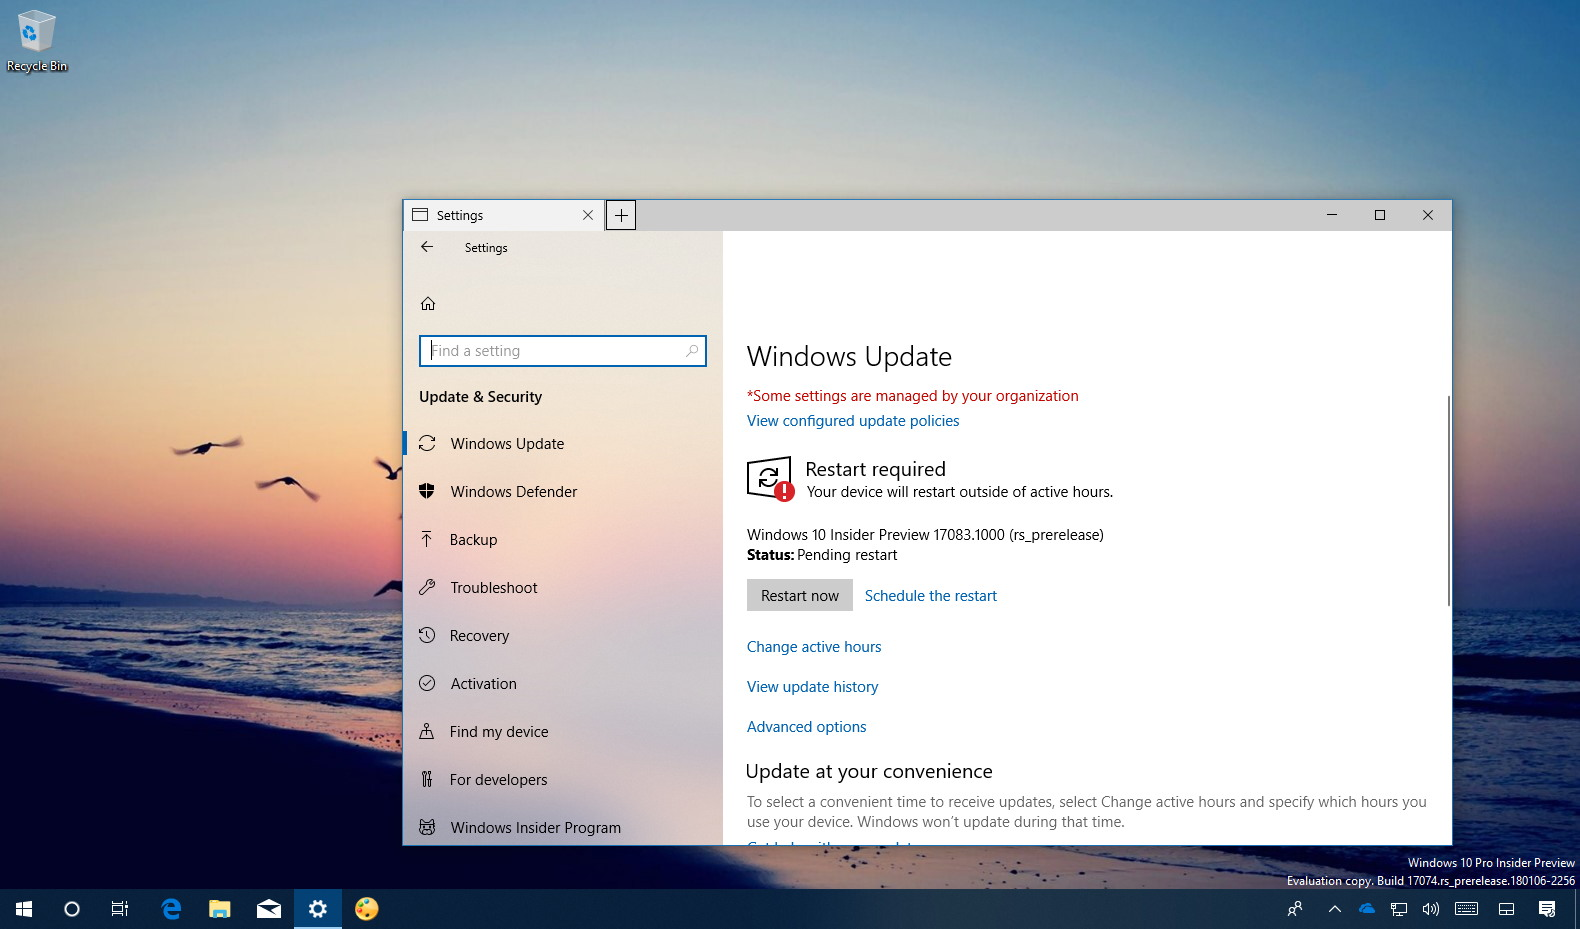 Windows 10 build 17803